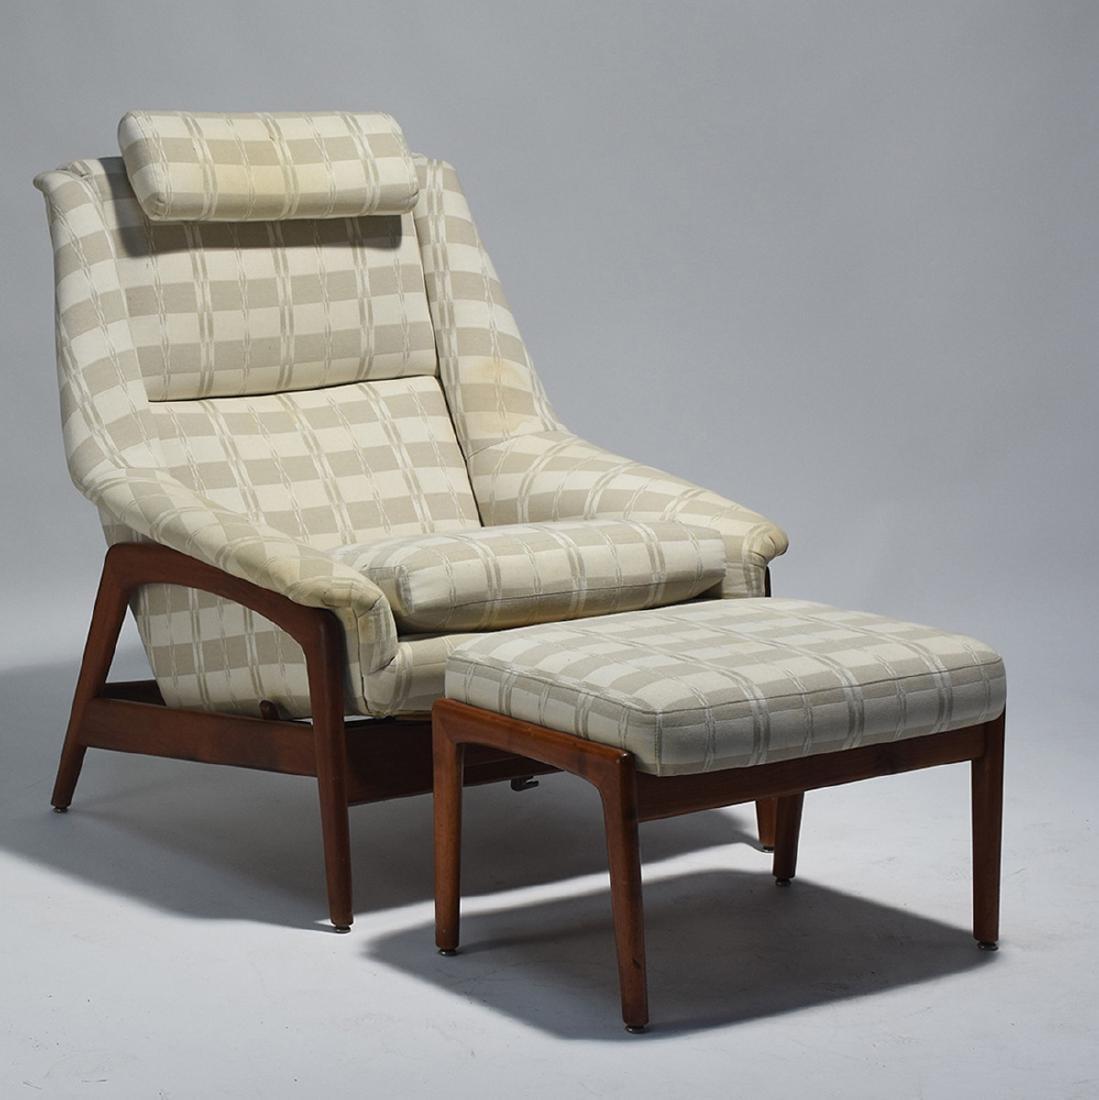 Dux Mid-Century teak reclining chair and ottoman